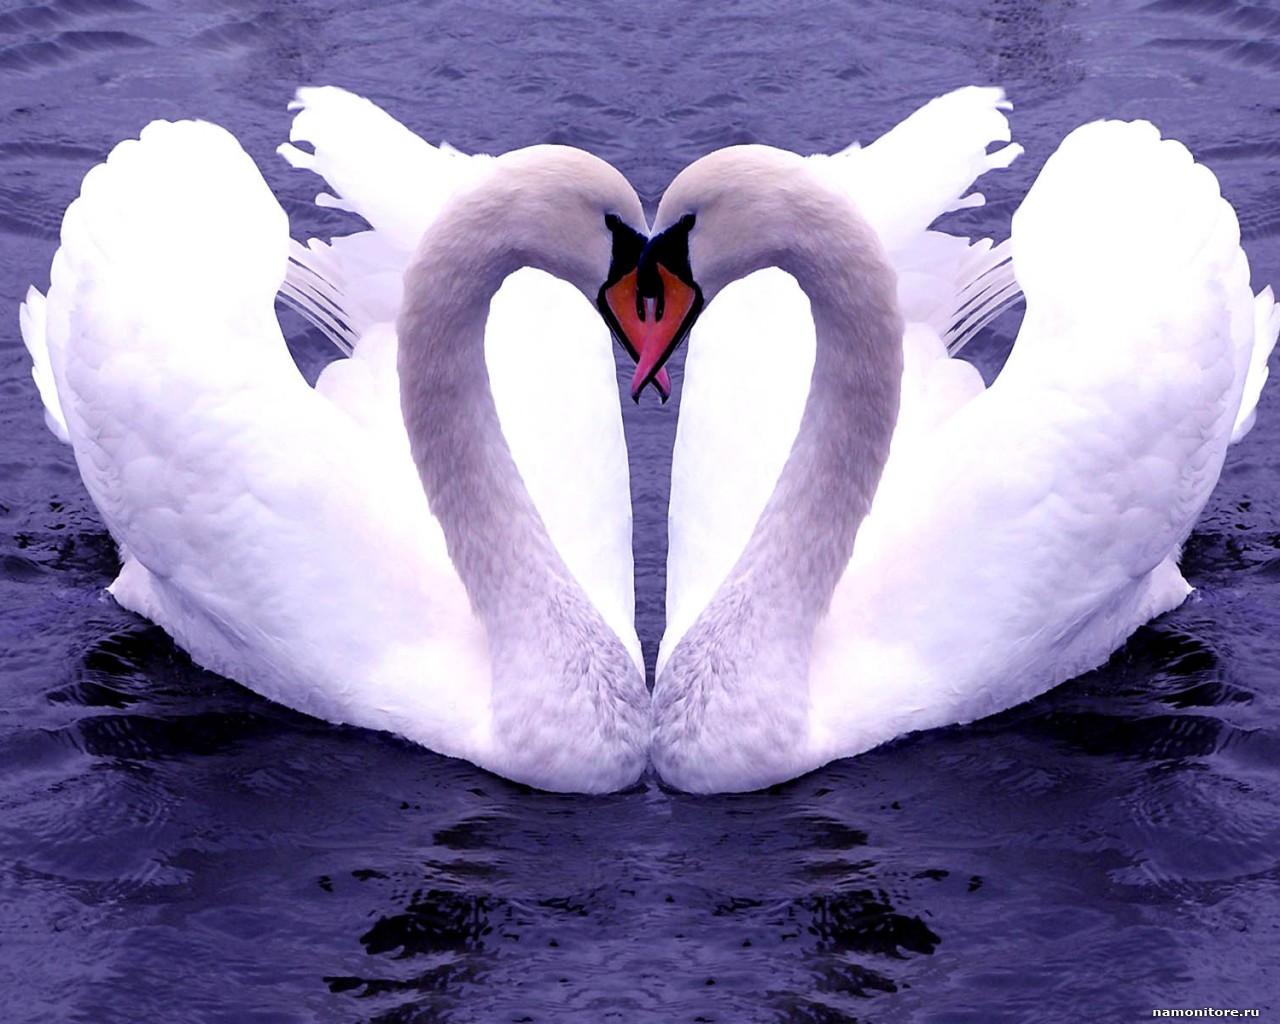 Кристина орбакайте — одна на двоих бессонница песни про любовь.